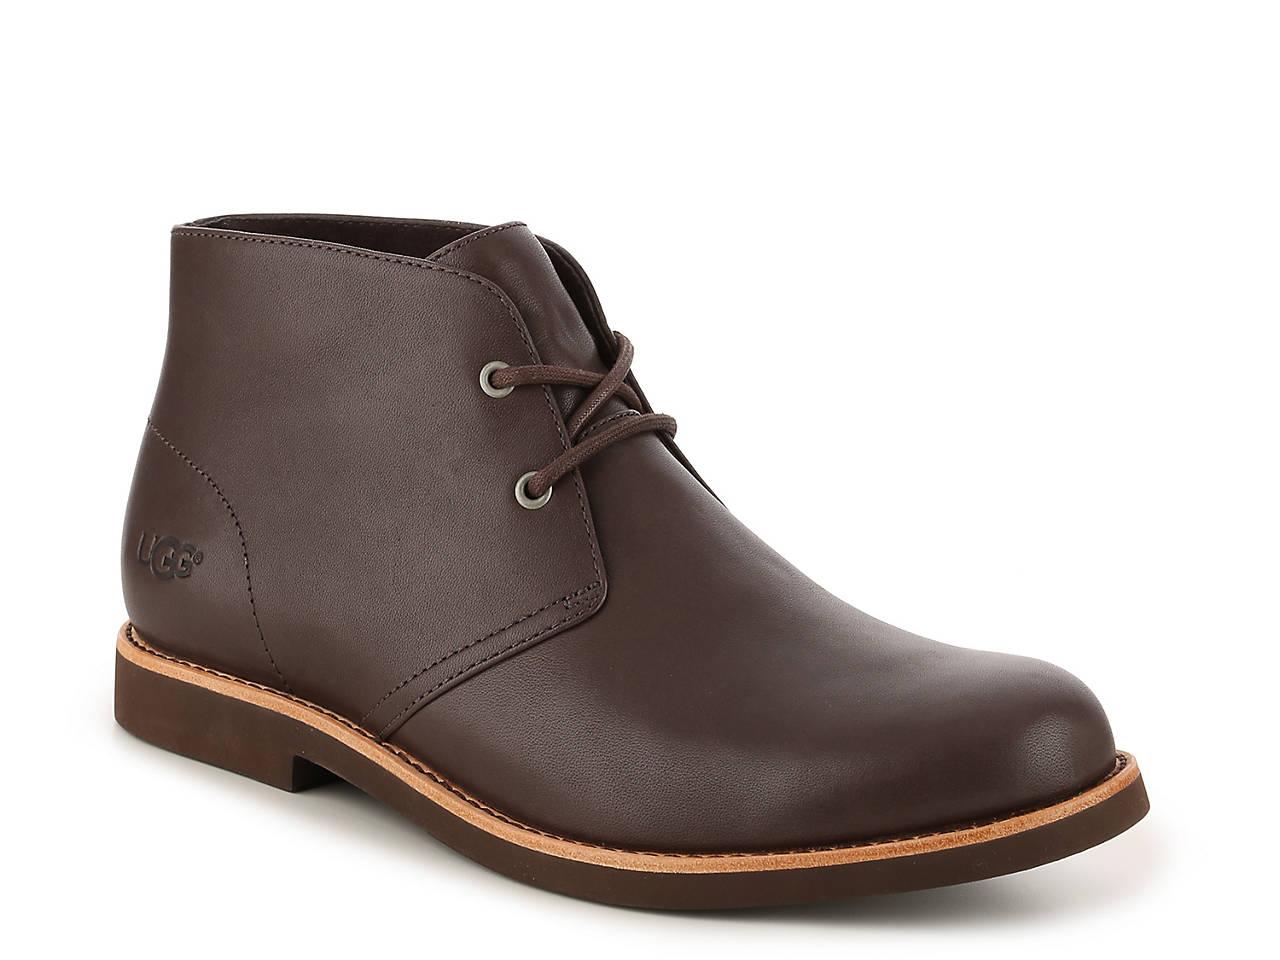 Westly Chukka Boot